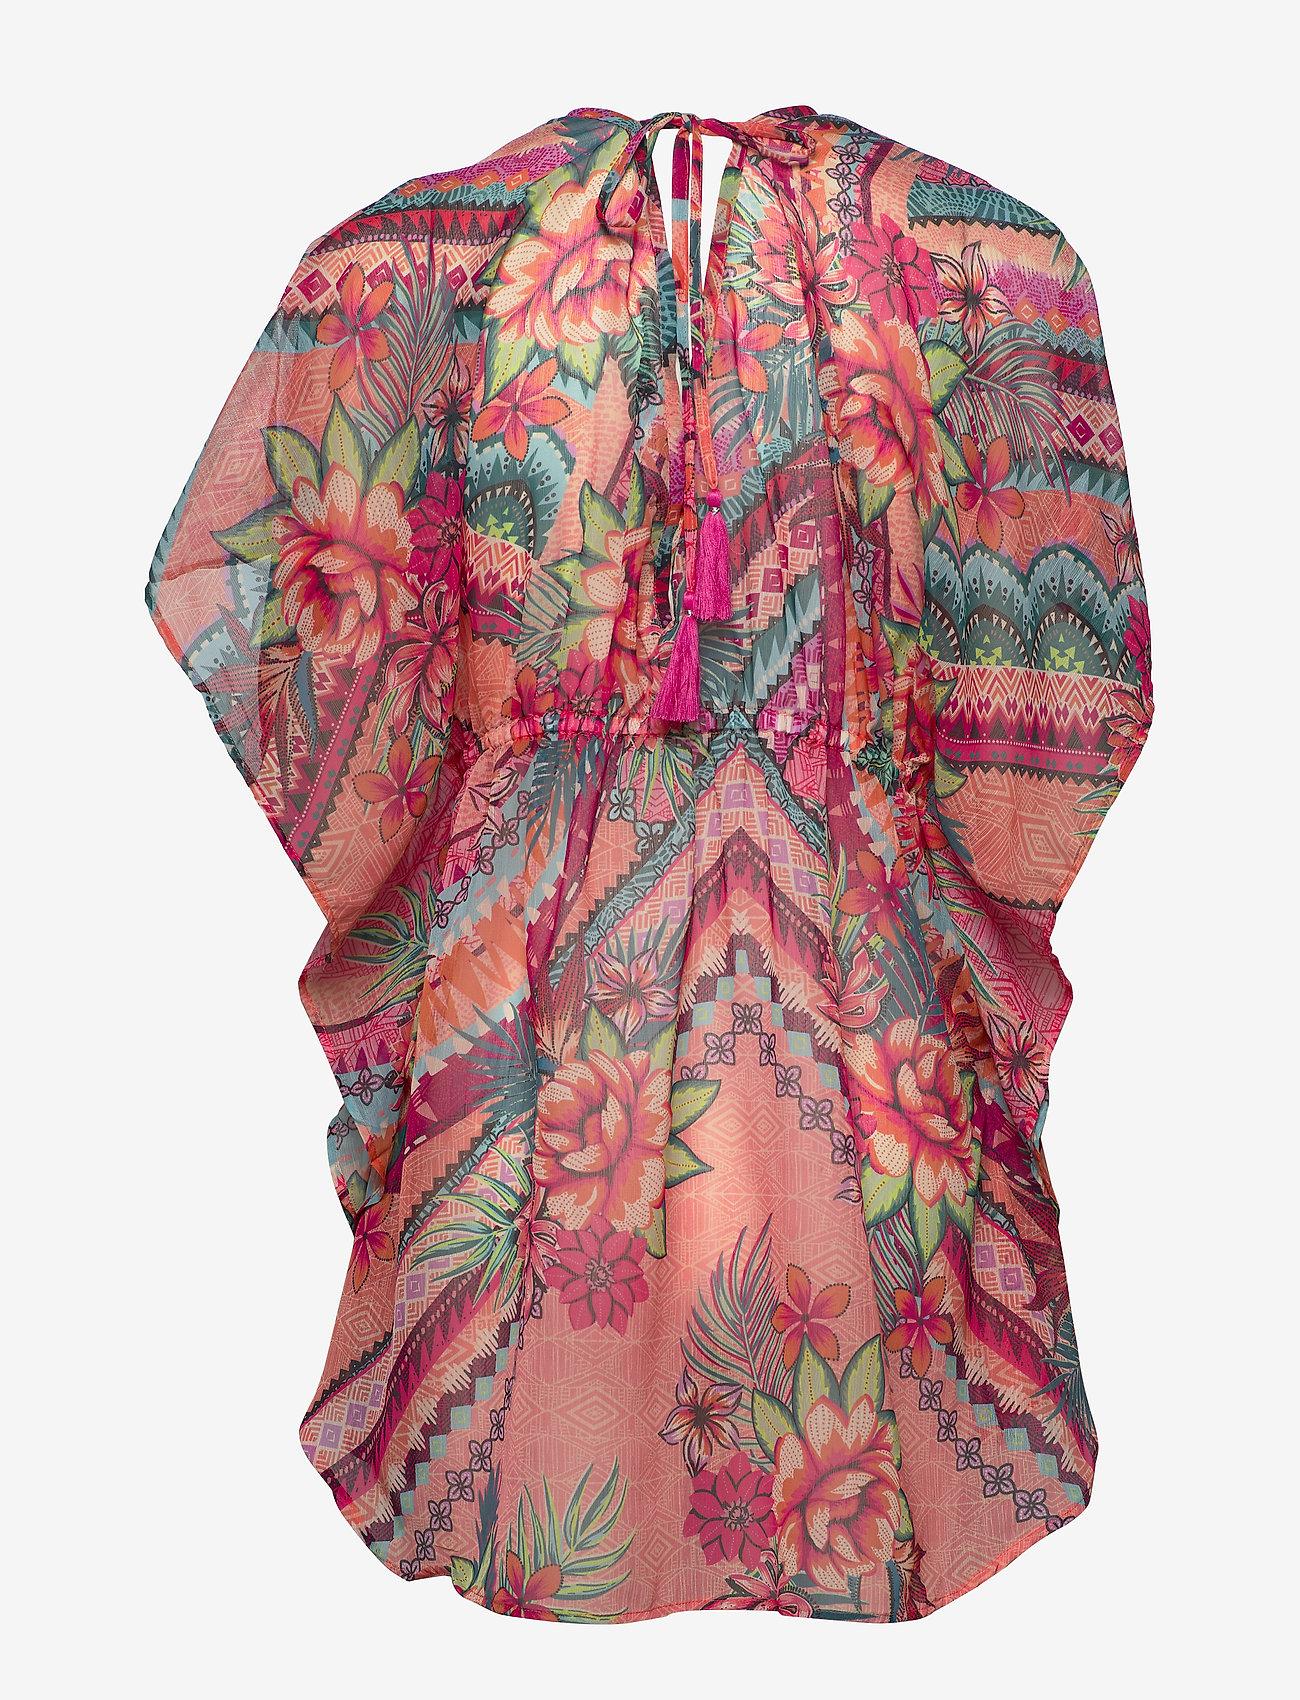 Marabella Beach Poncho Aop (Flower Print) - Missya cOlohp